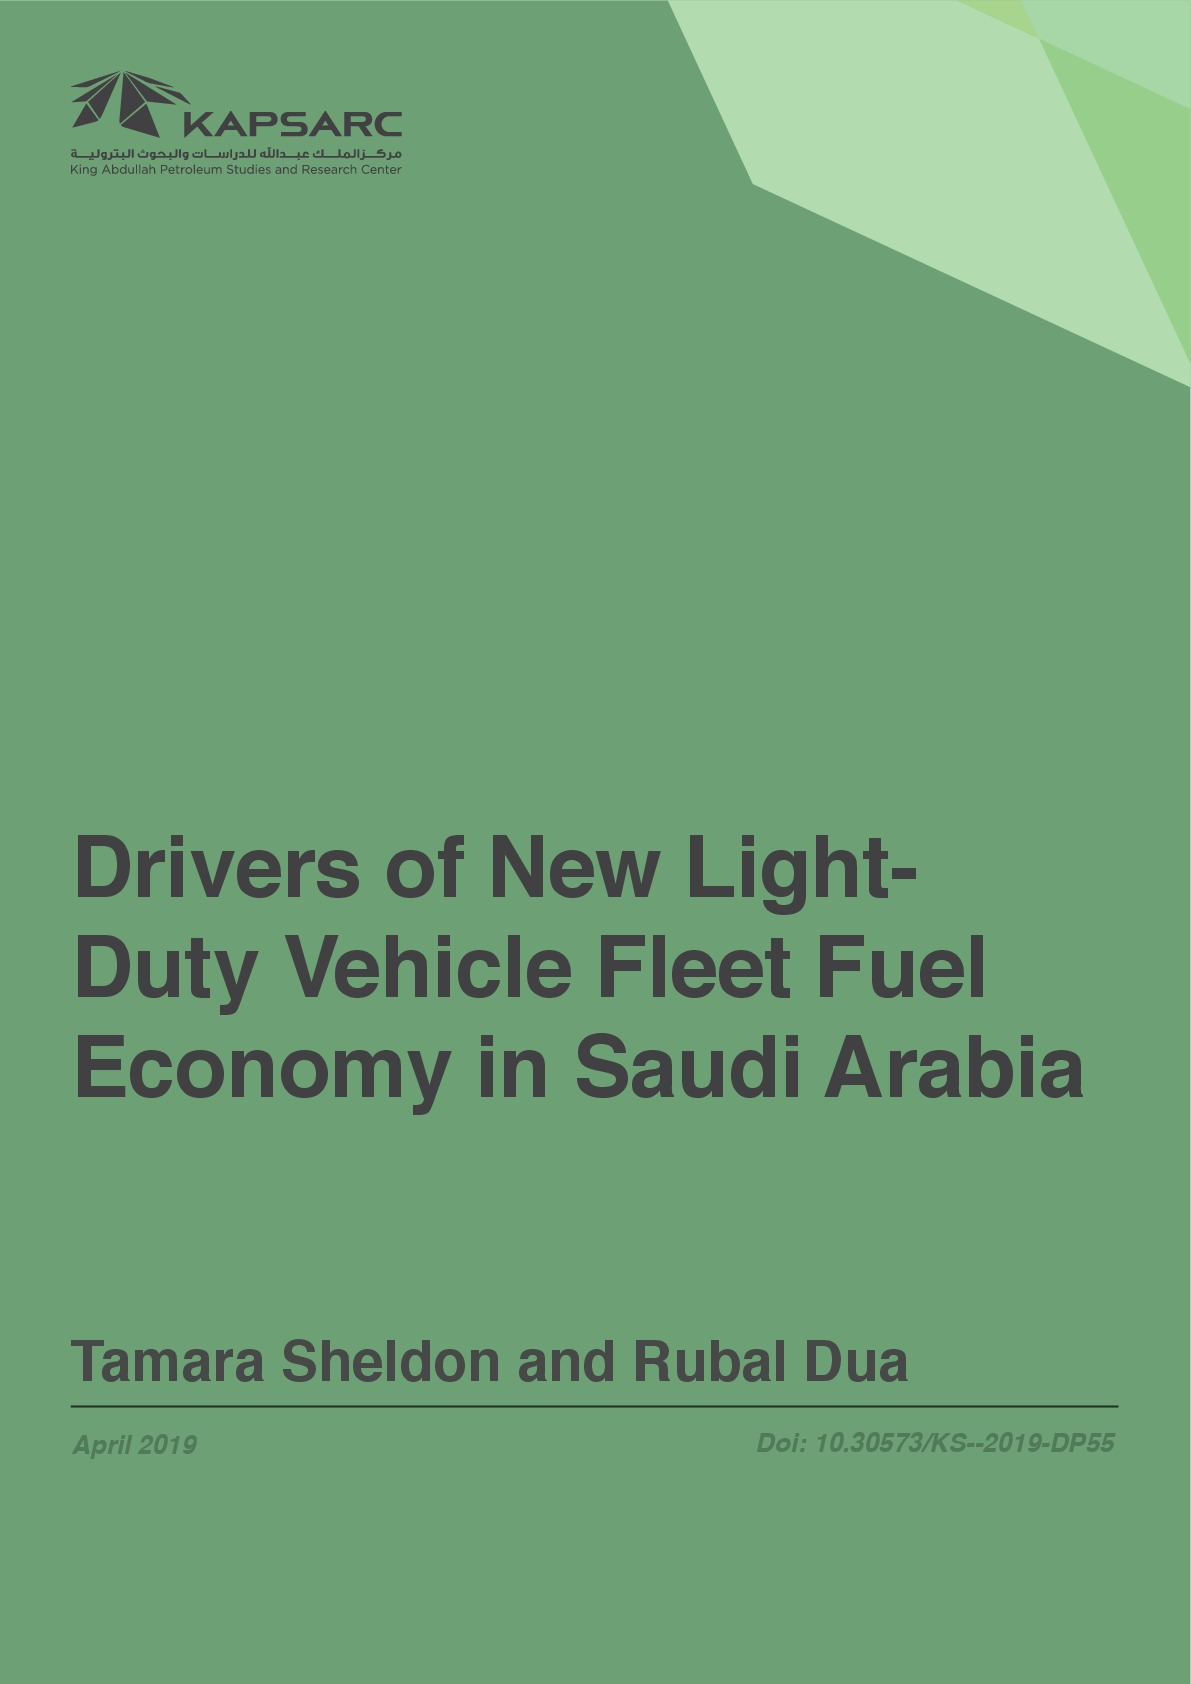 Drivers of New Light-Duty Vehicle Fleet Fuel Economy in Saudi Arabia